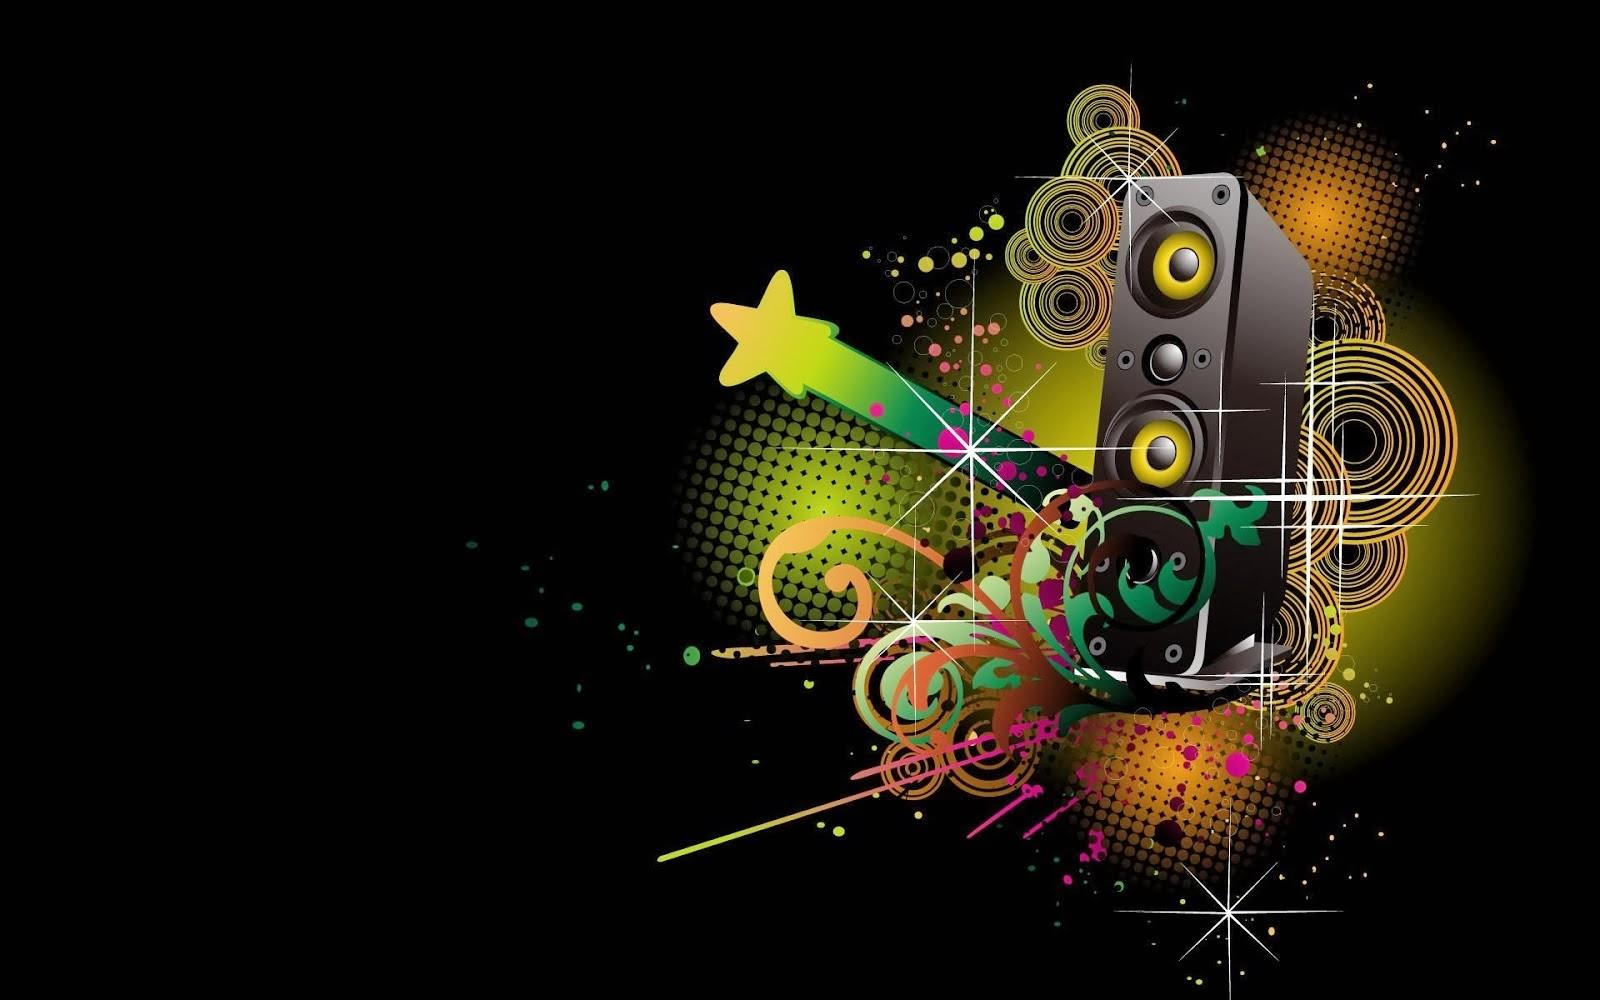 Cool Music HD Wallpapers | Hindi Motivational Quotes | HD Wallpapers | Windows 8 Wallpapers ...